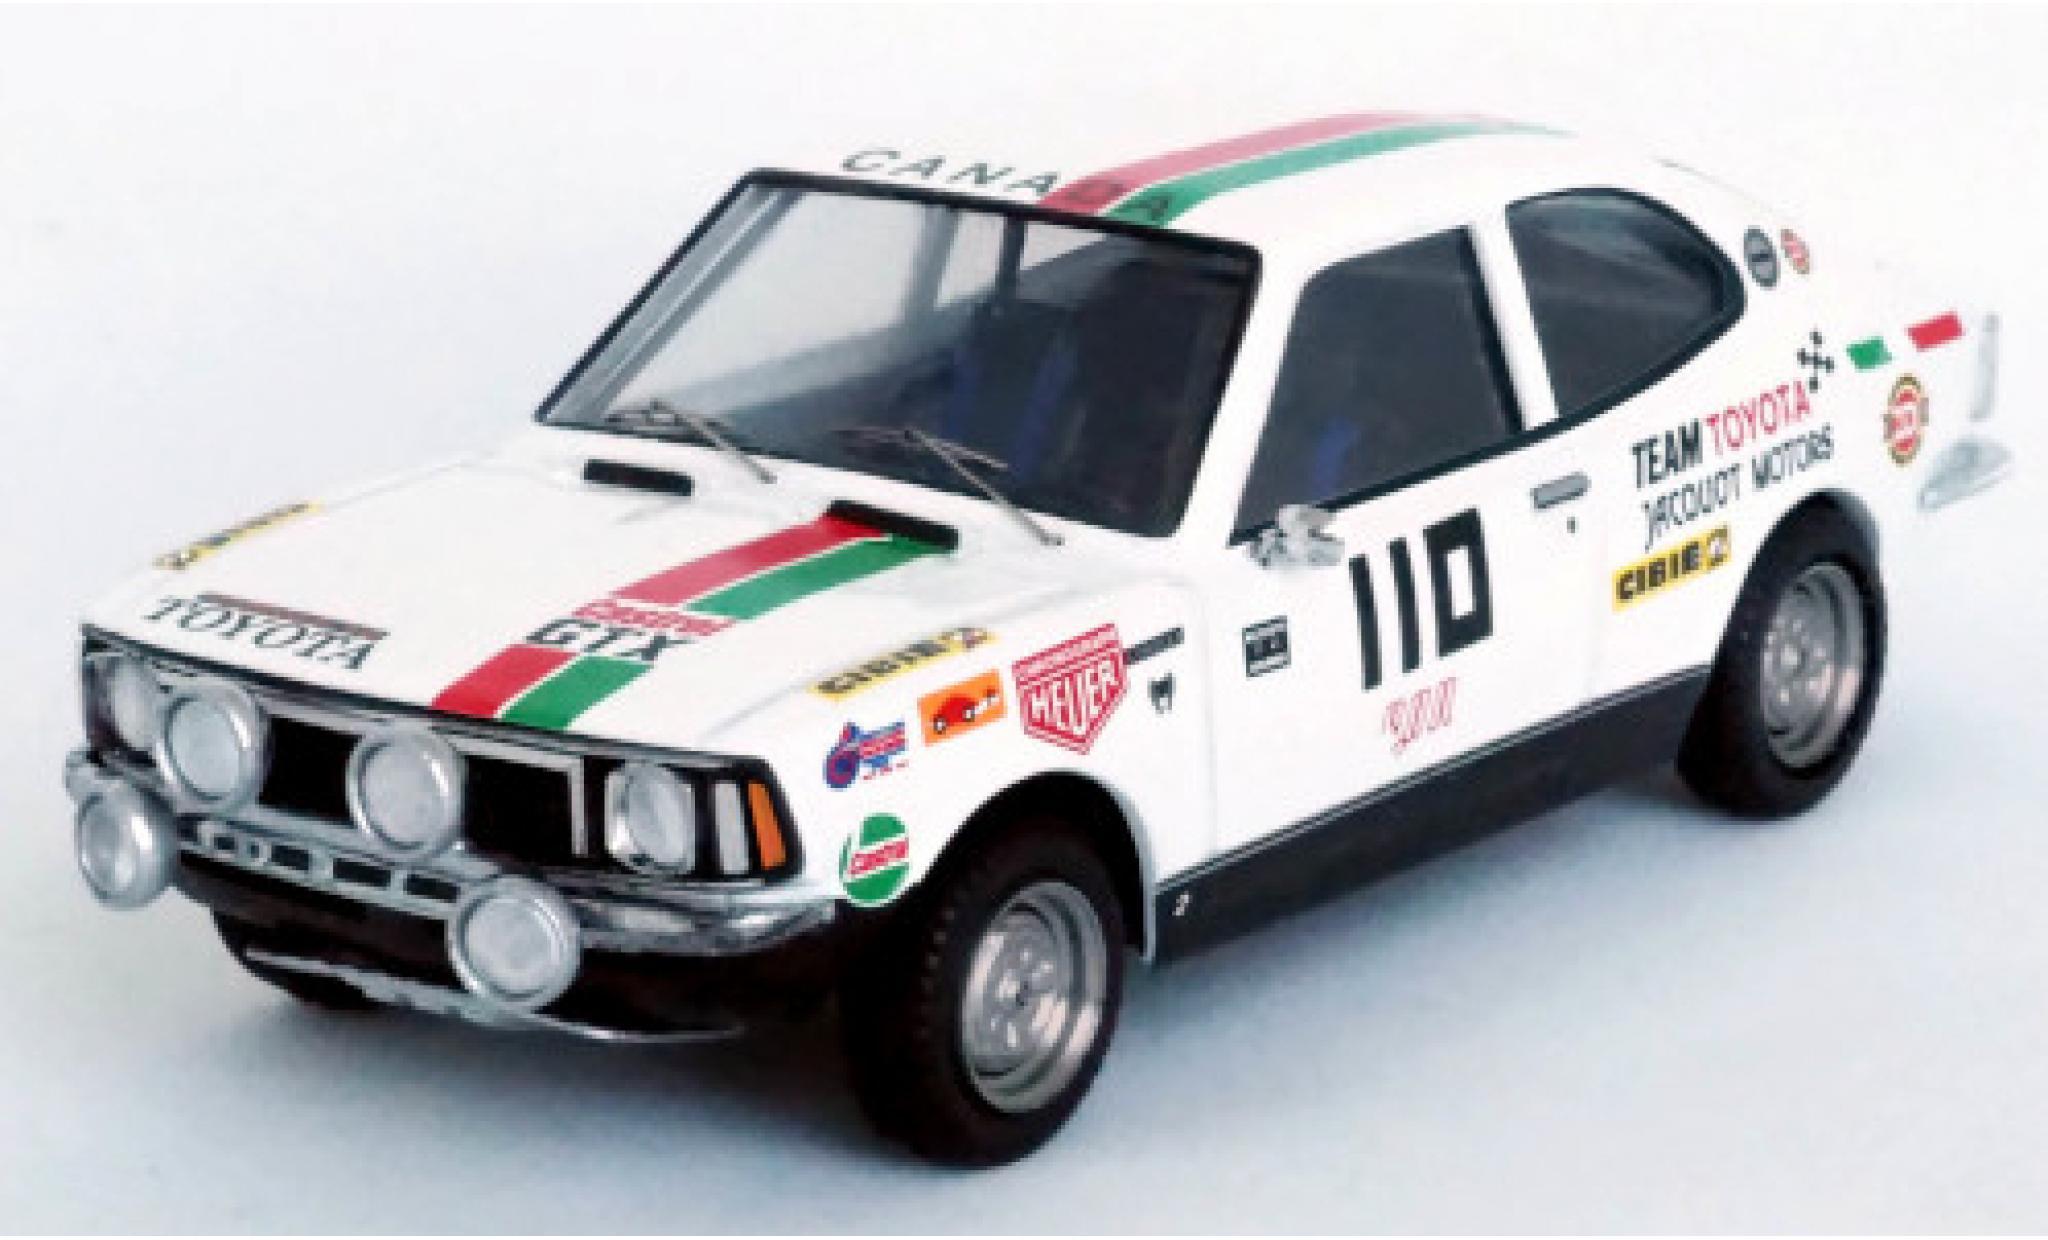 Toyota Corolla 1/43 Trofeu Levin No.110 Team Jacquot Motors Castrol Rally Press-on-Regardless 1973 W.Boyce/D.Woods